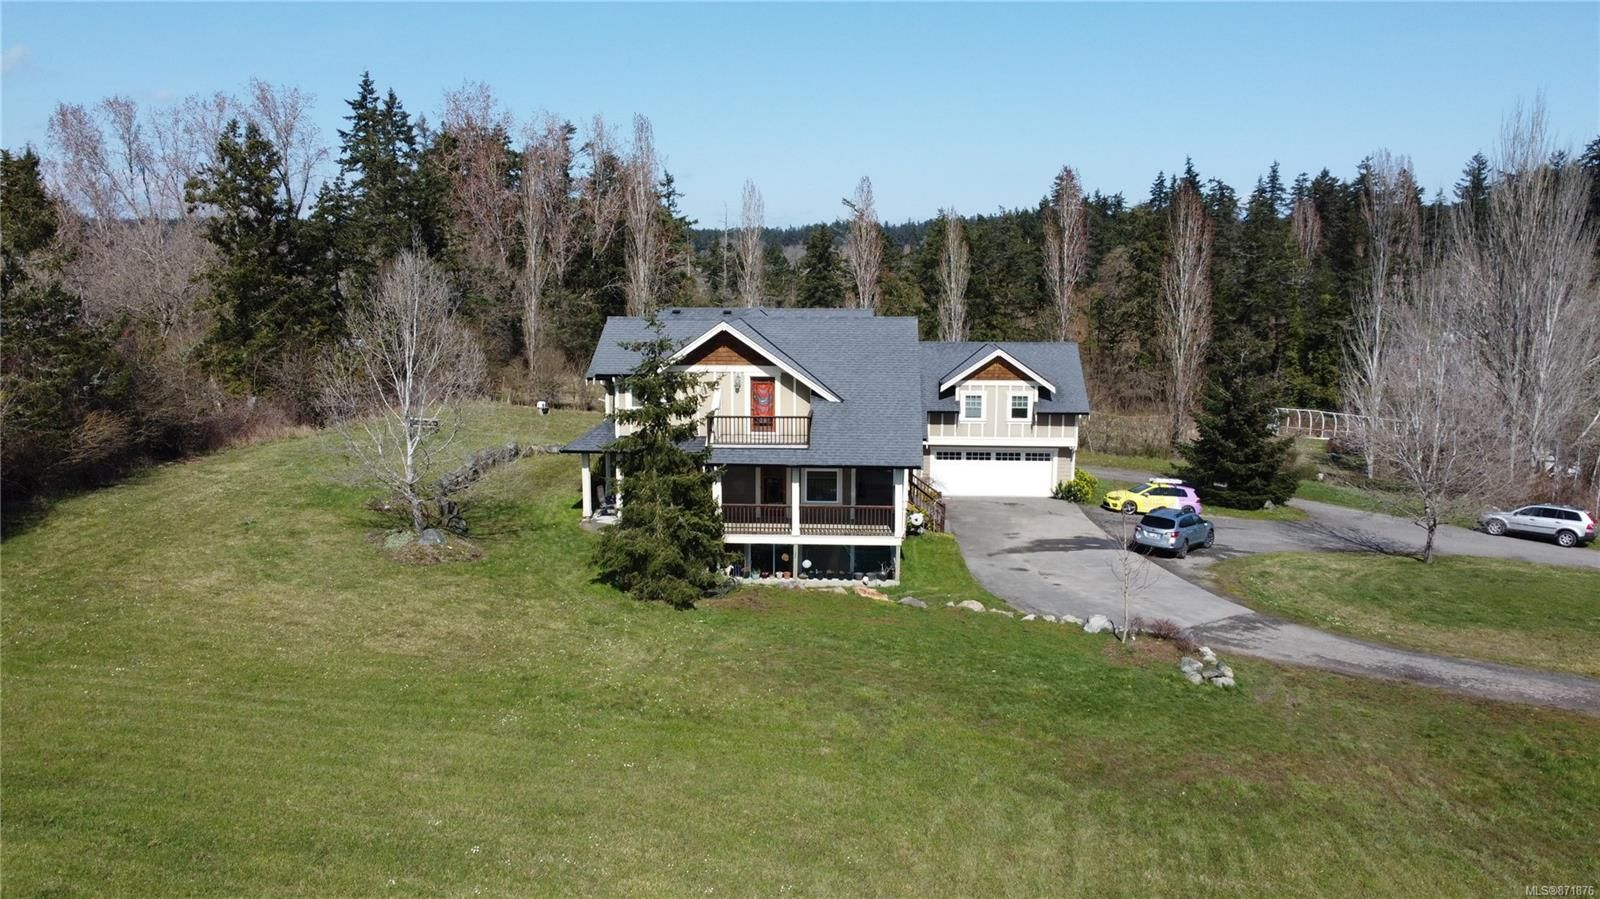 Photo 4: Photos: 4420 Wilkinson Rd in : SW Royal Oak House for sale (Saanich West)  : MLS®# 871876